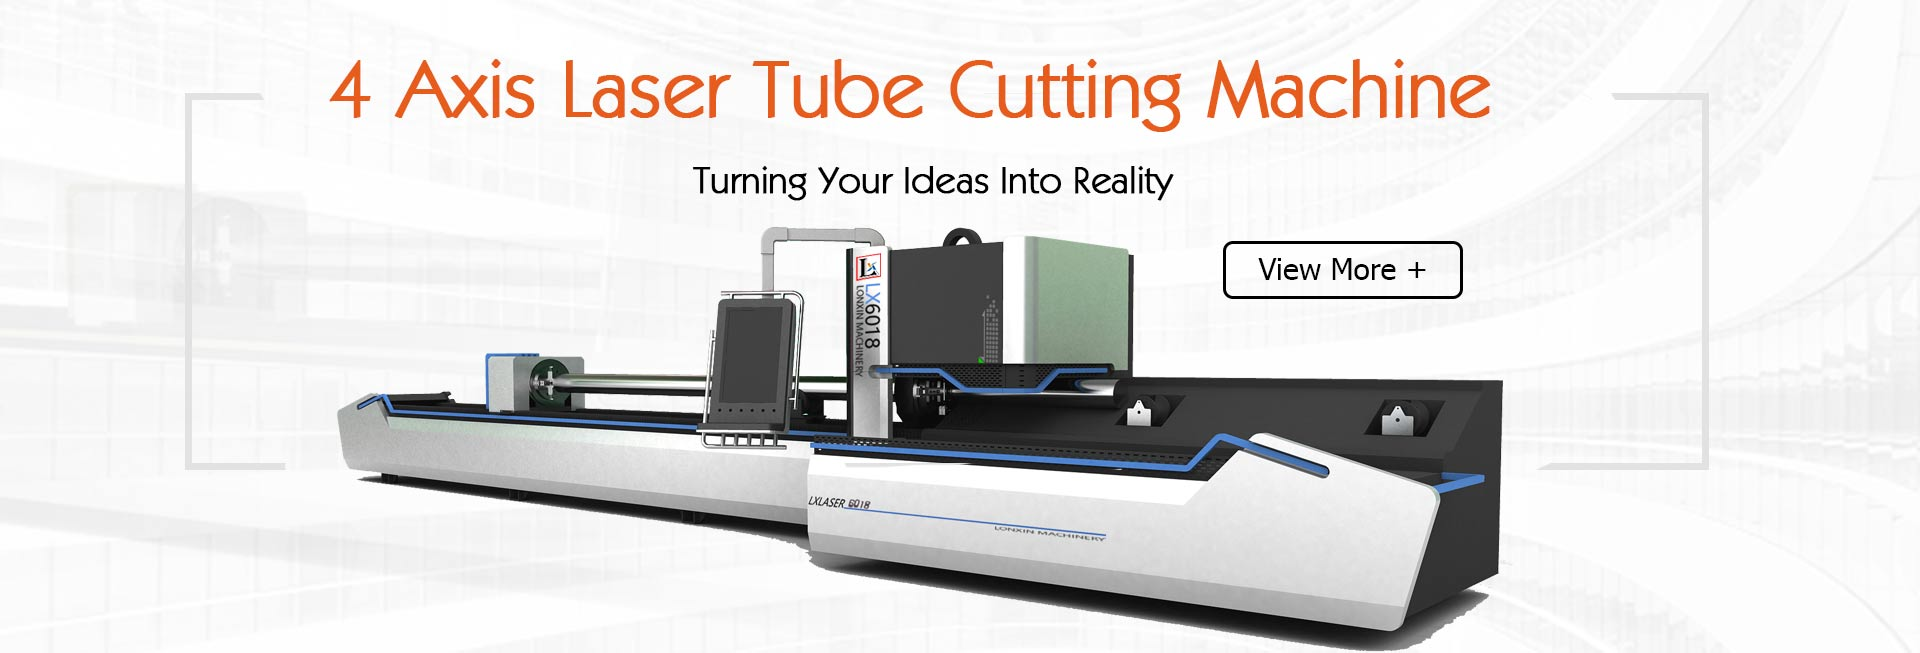 4 Axis Laser Tube Cutting Machine